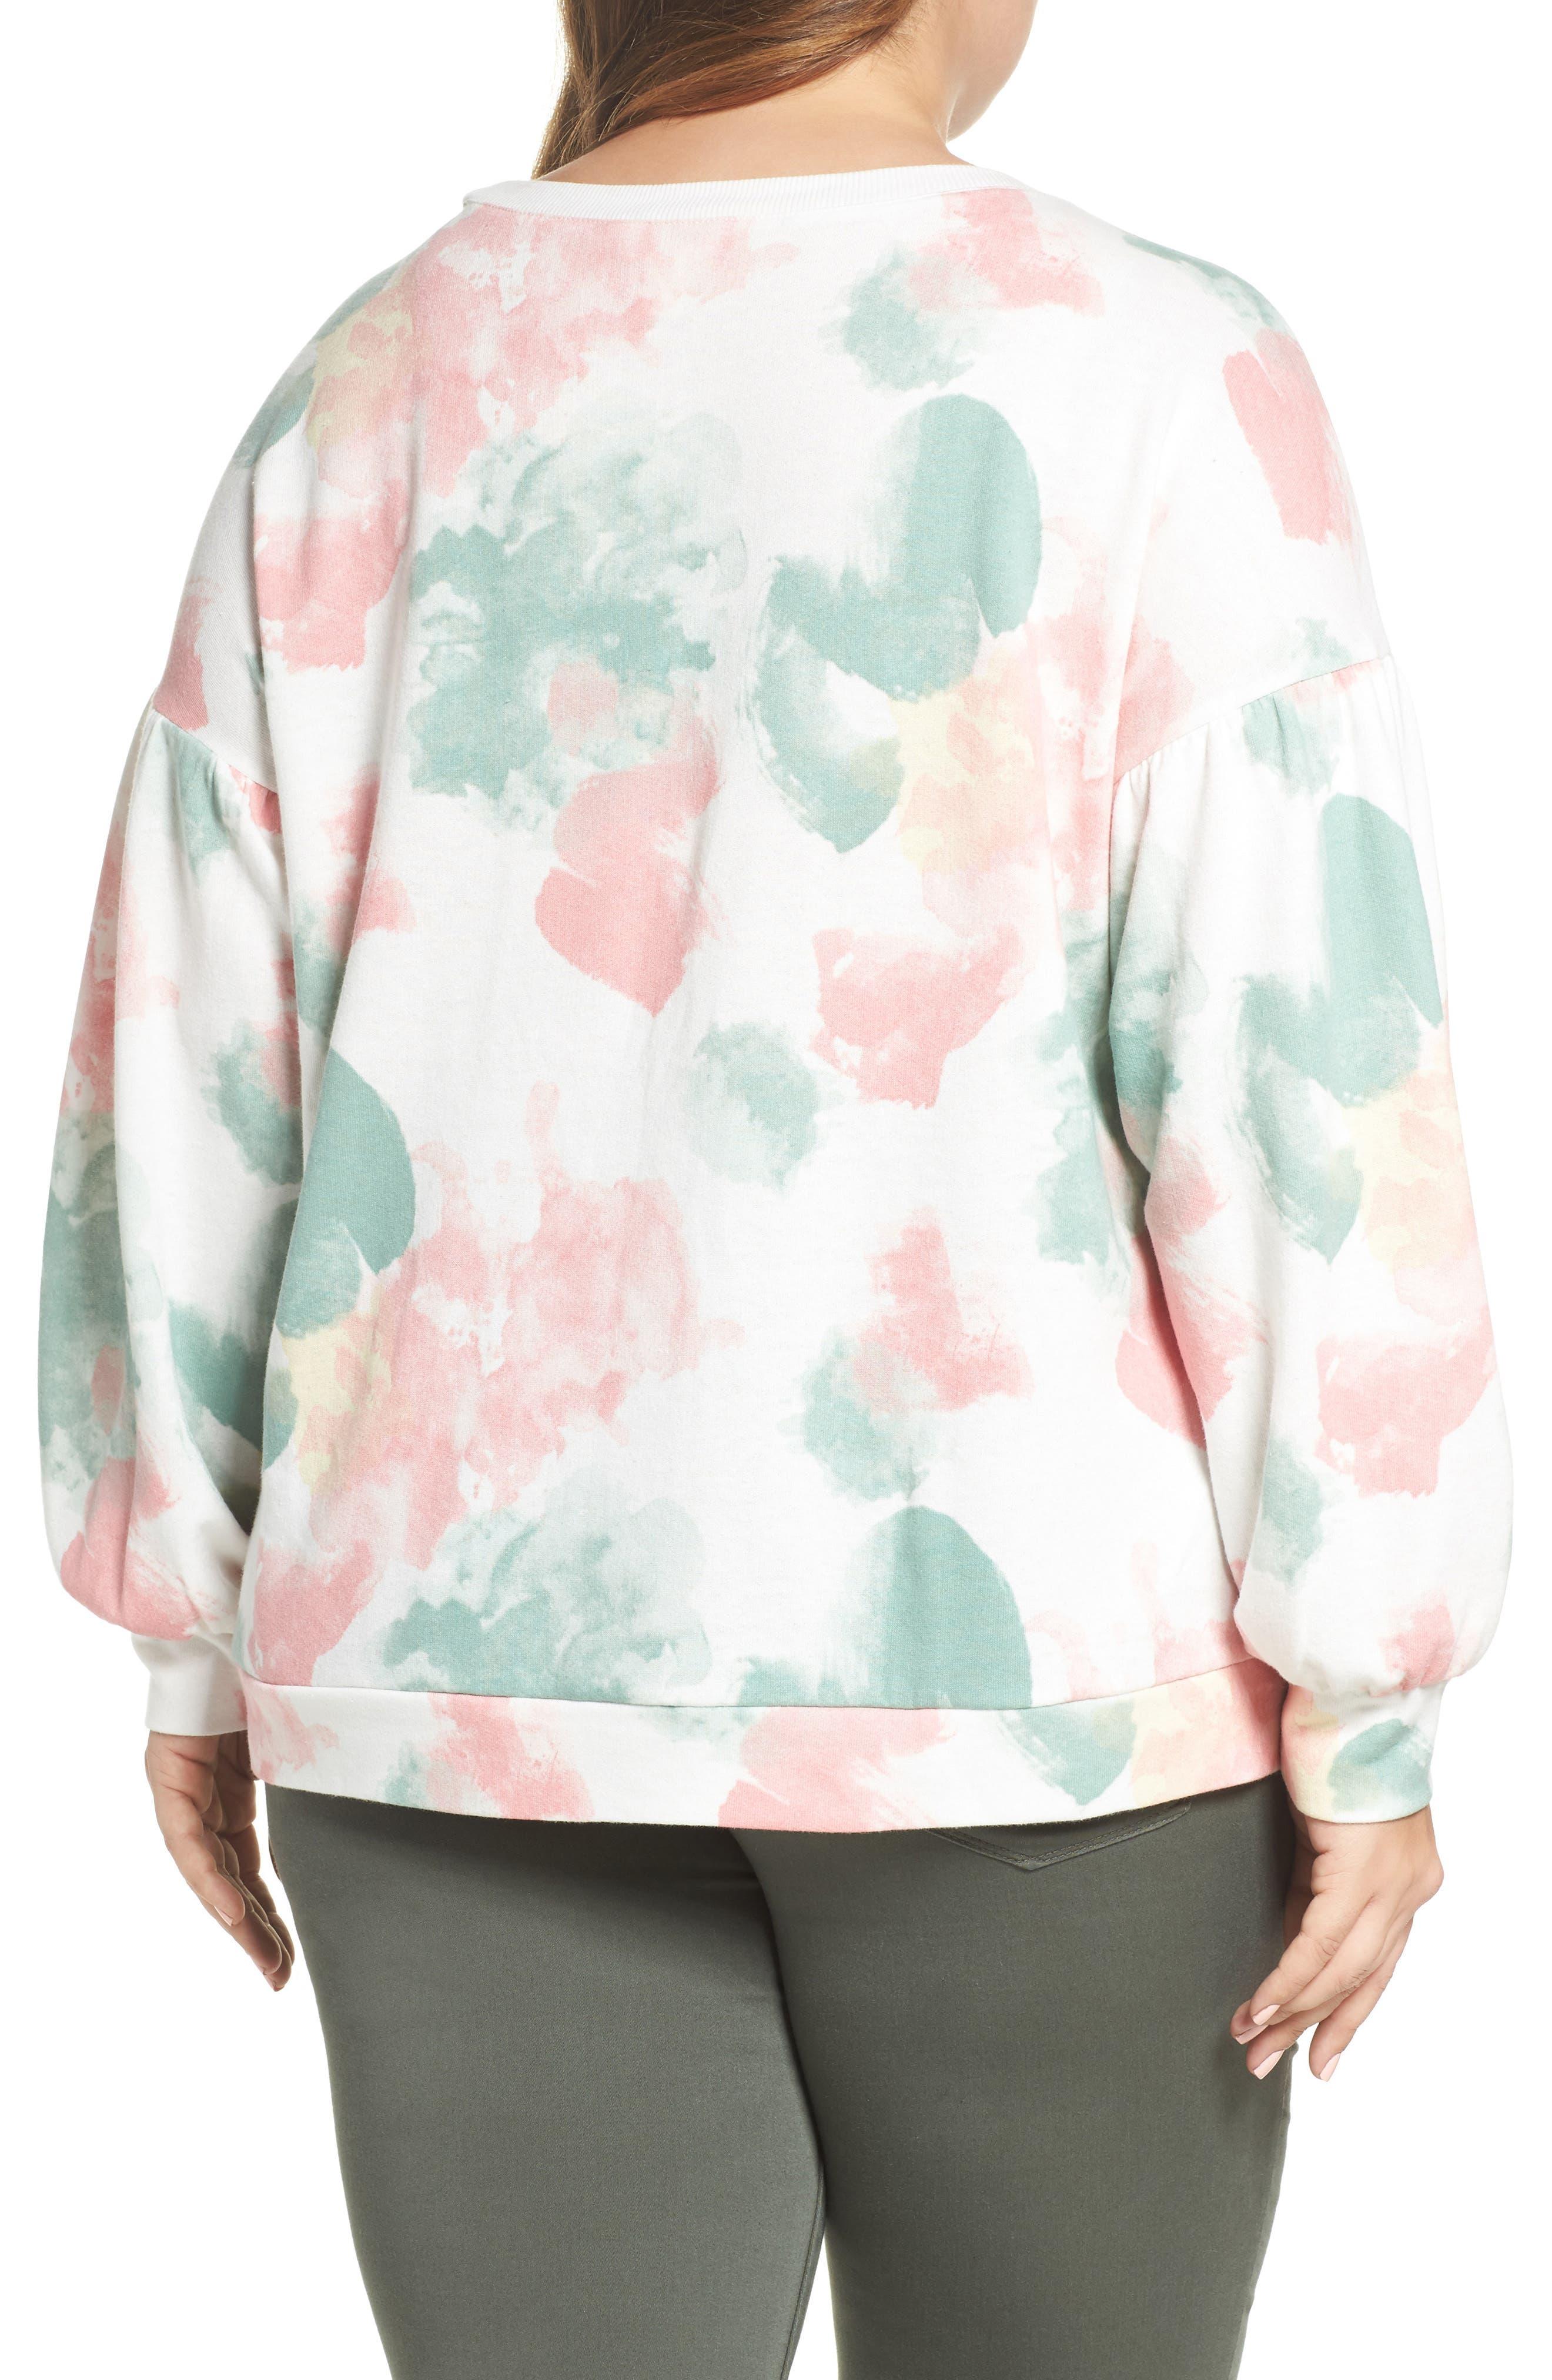 Blouson Sleeve Sweatshirt,                             Alternate thumbnail 2, color,                             900